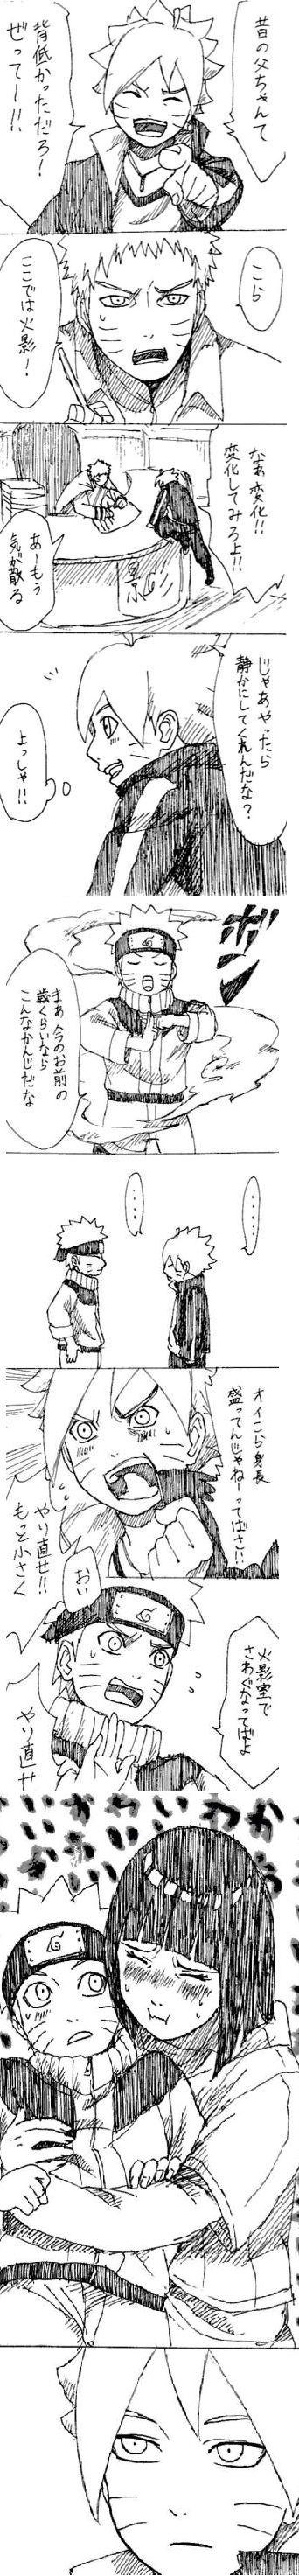 Naruto, Boruto, and Hinata/ please someone translate this!!